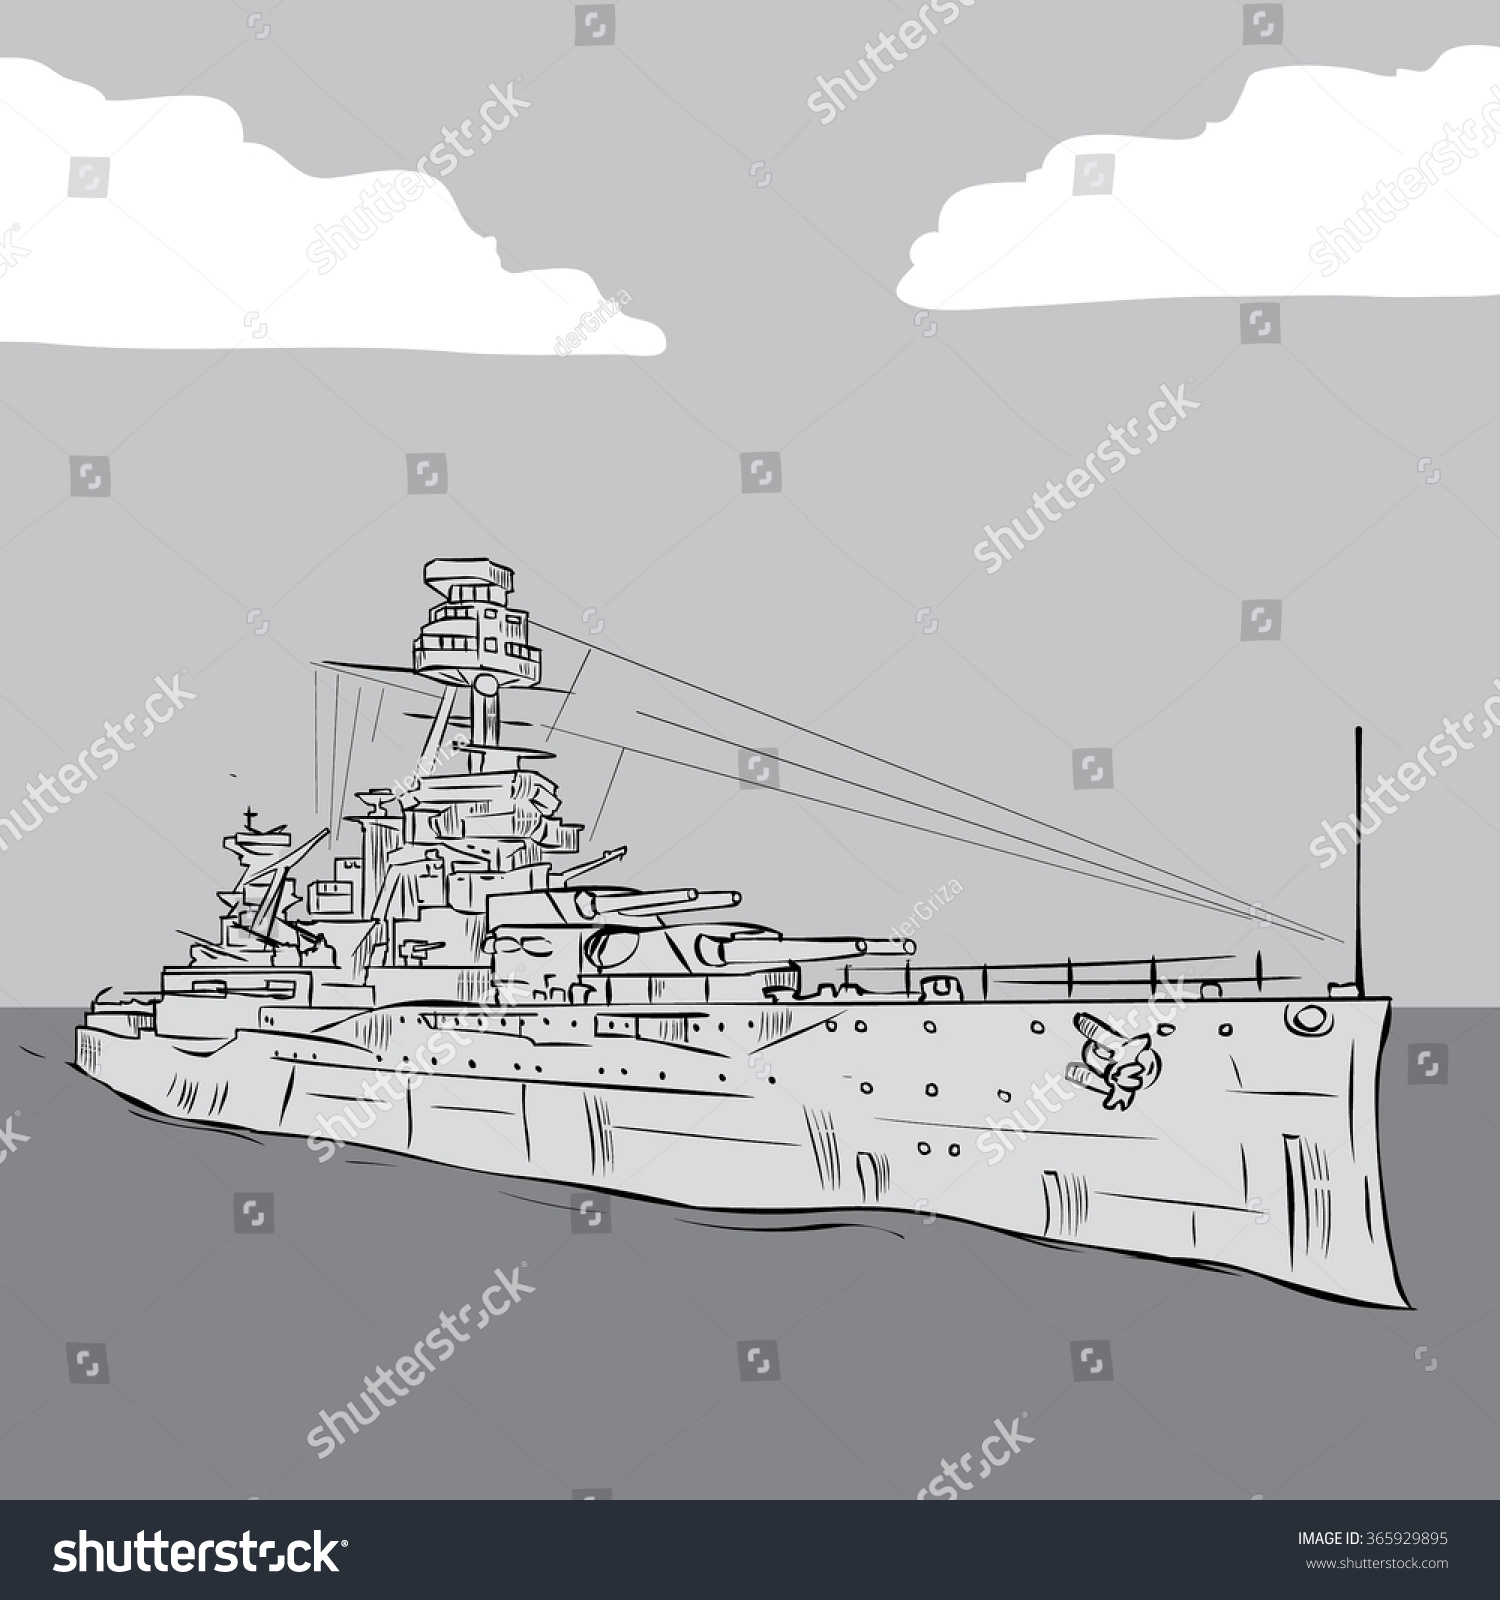 hight resolution of world war 2 us battleship hand drawn vector illustration